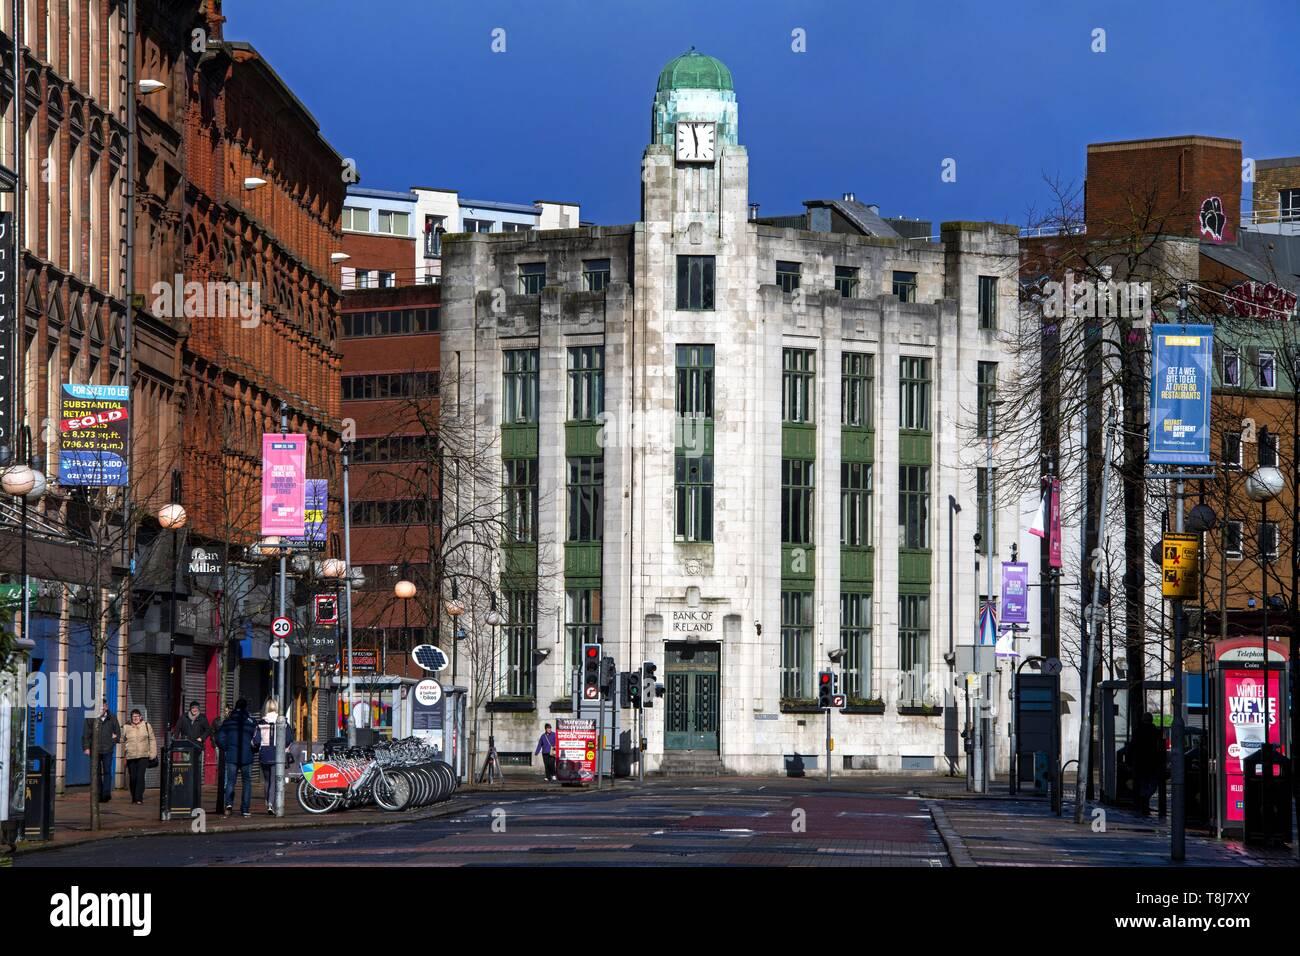 United Kingdom, Northern Ireland, art deco building of the former Bank of Ireland - Stock Image